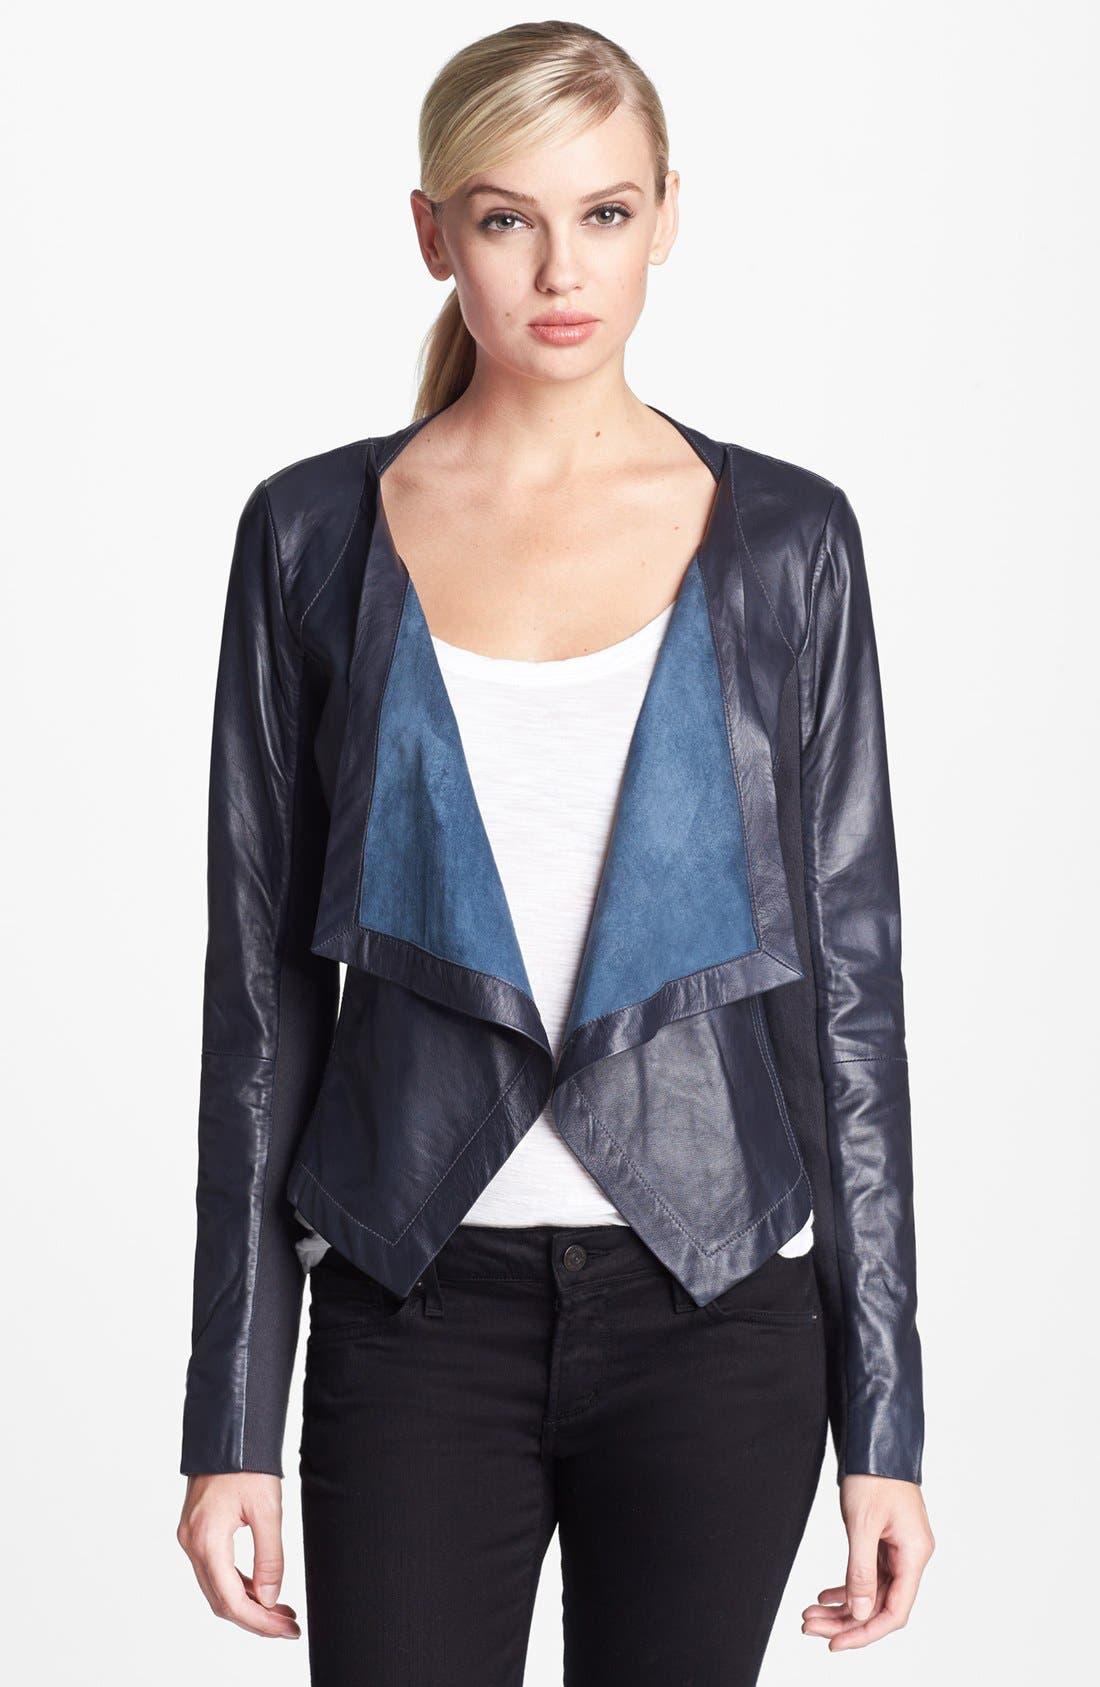 Alternate Image 2 Selected - Cascade Leather Jacket